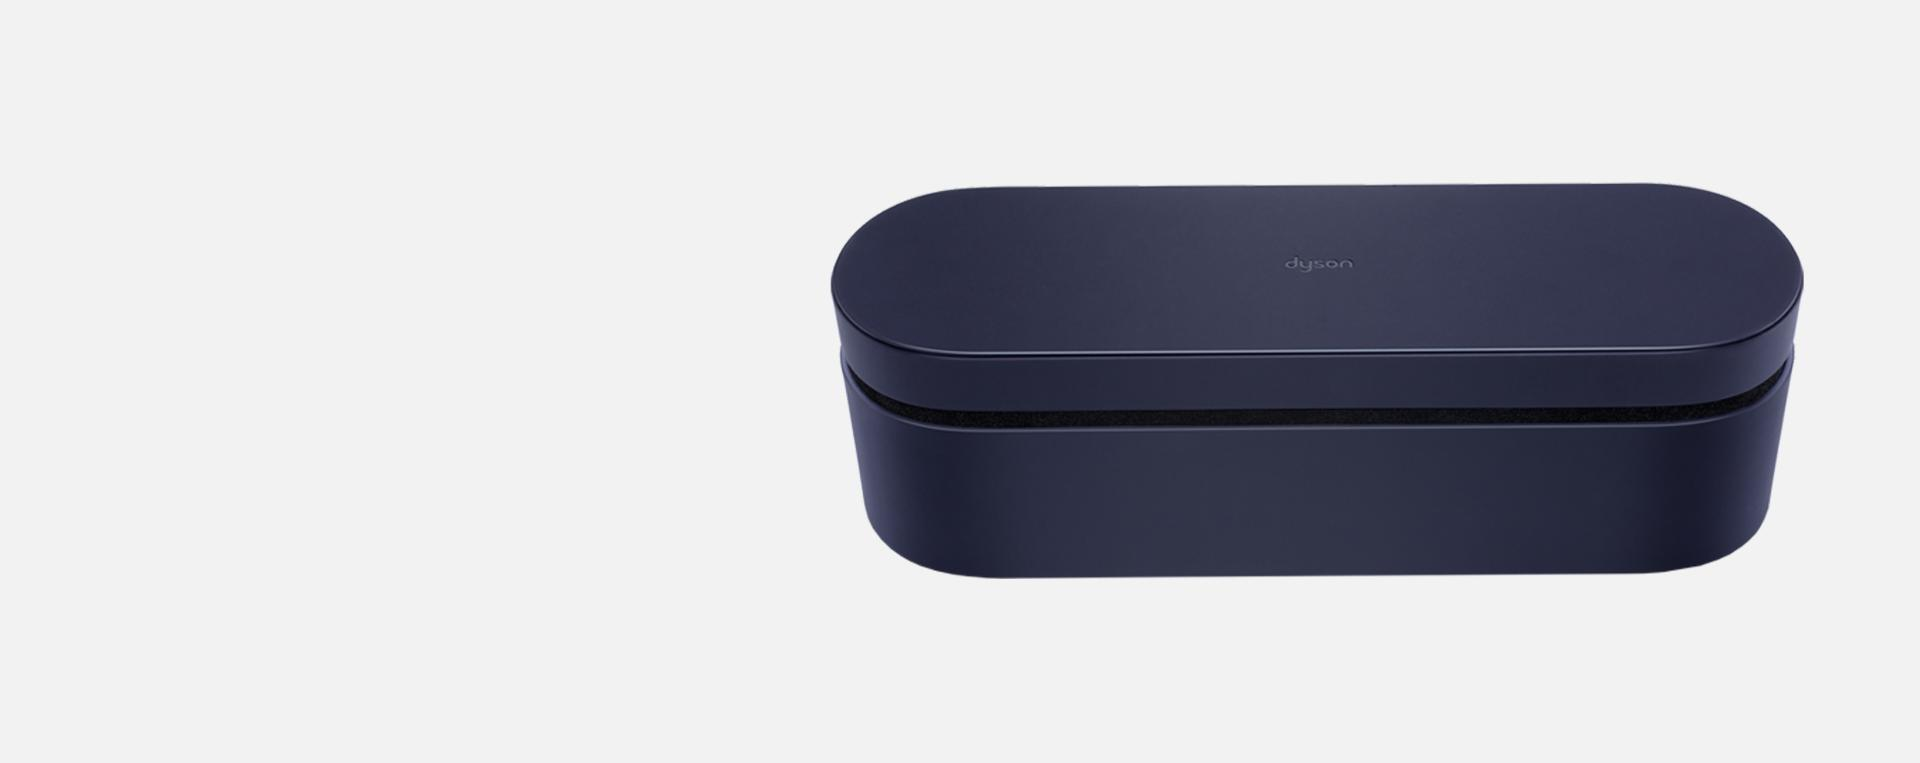 Dark blue Dyson-designed presentation case.